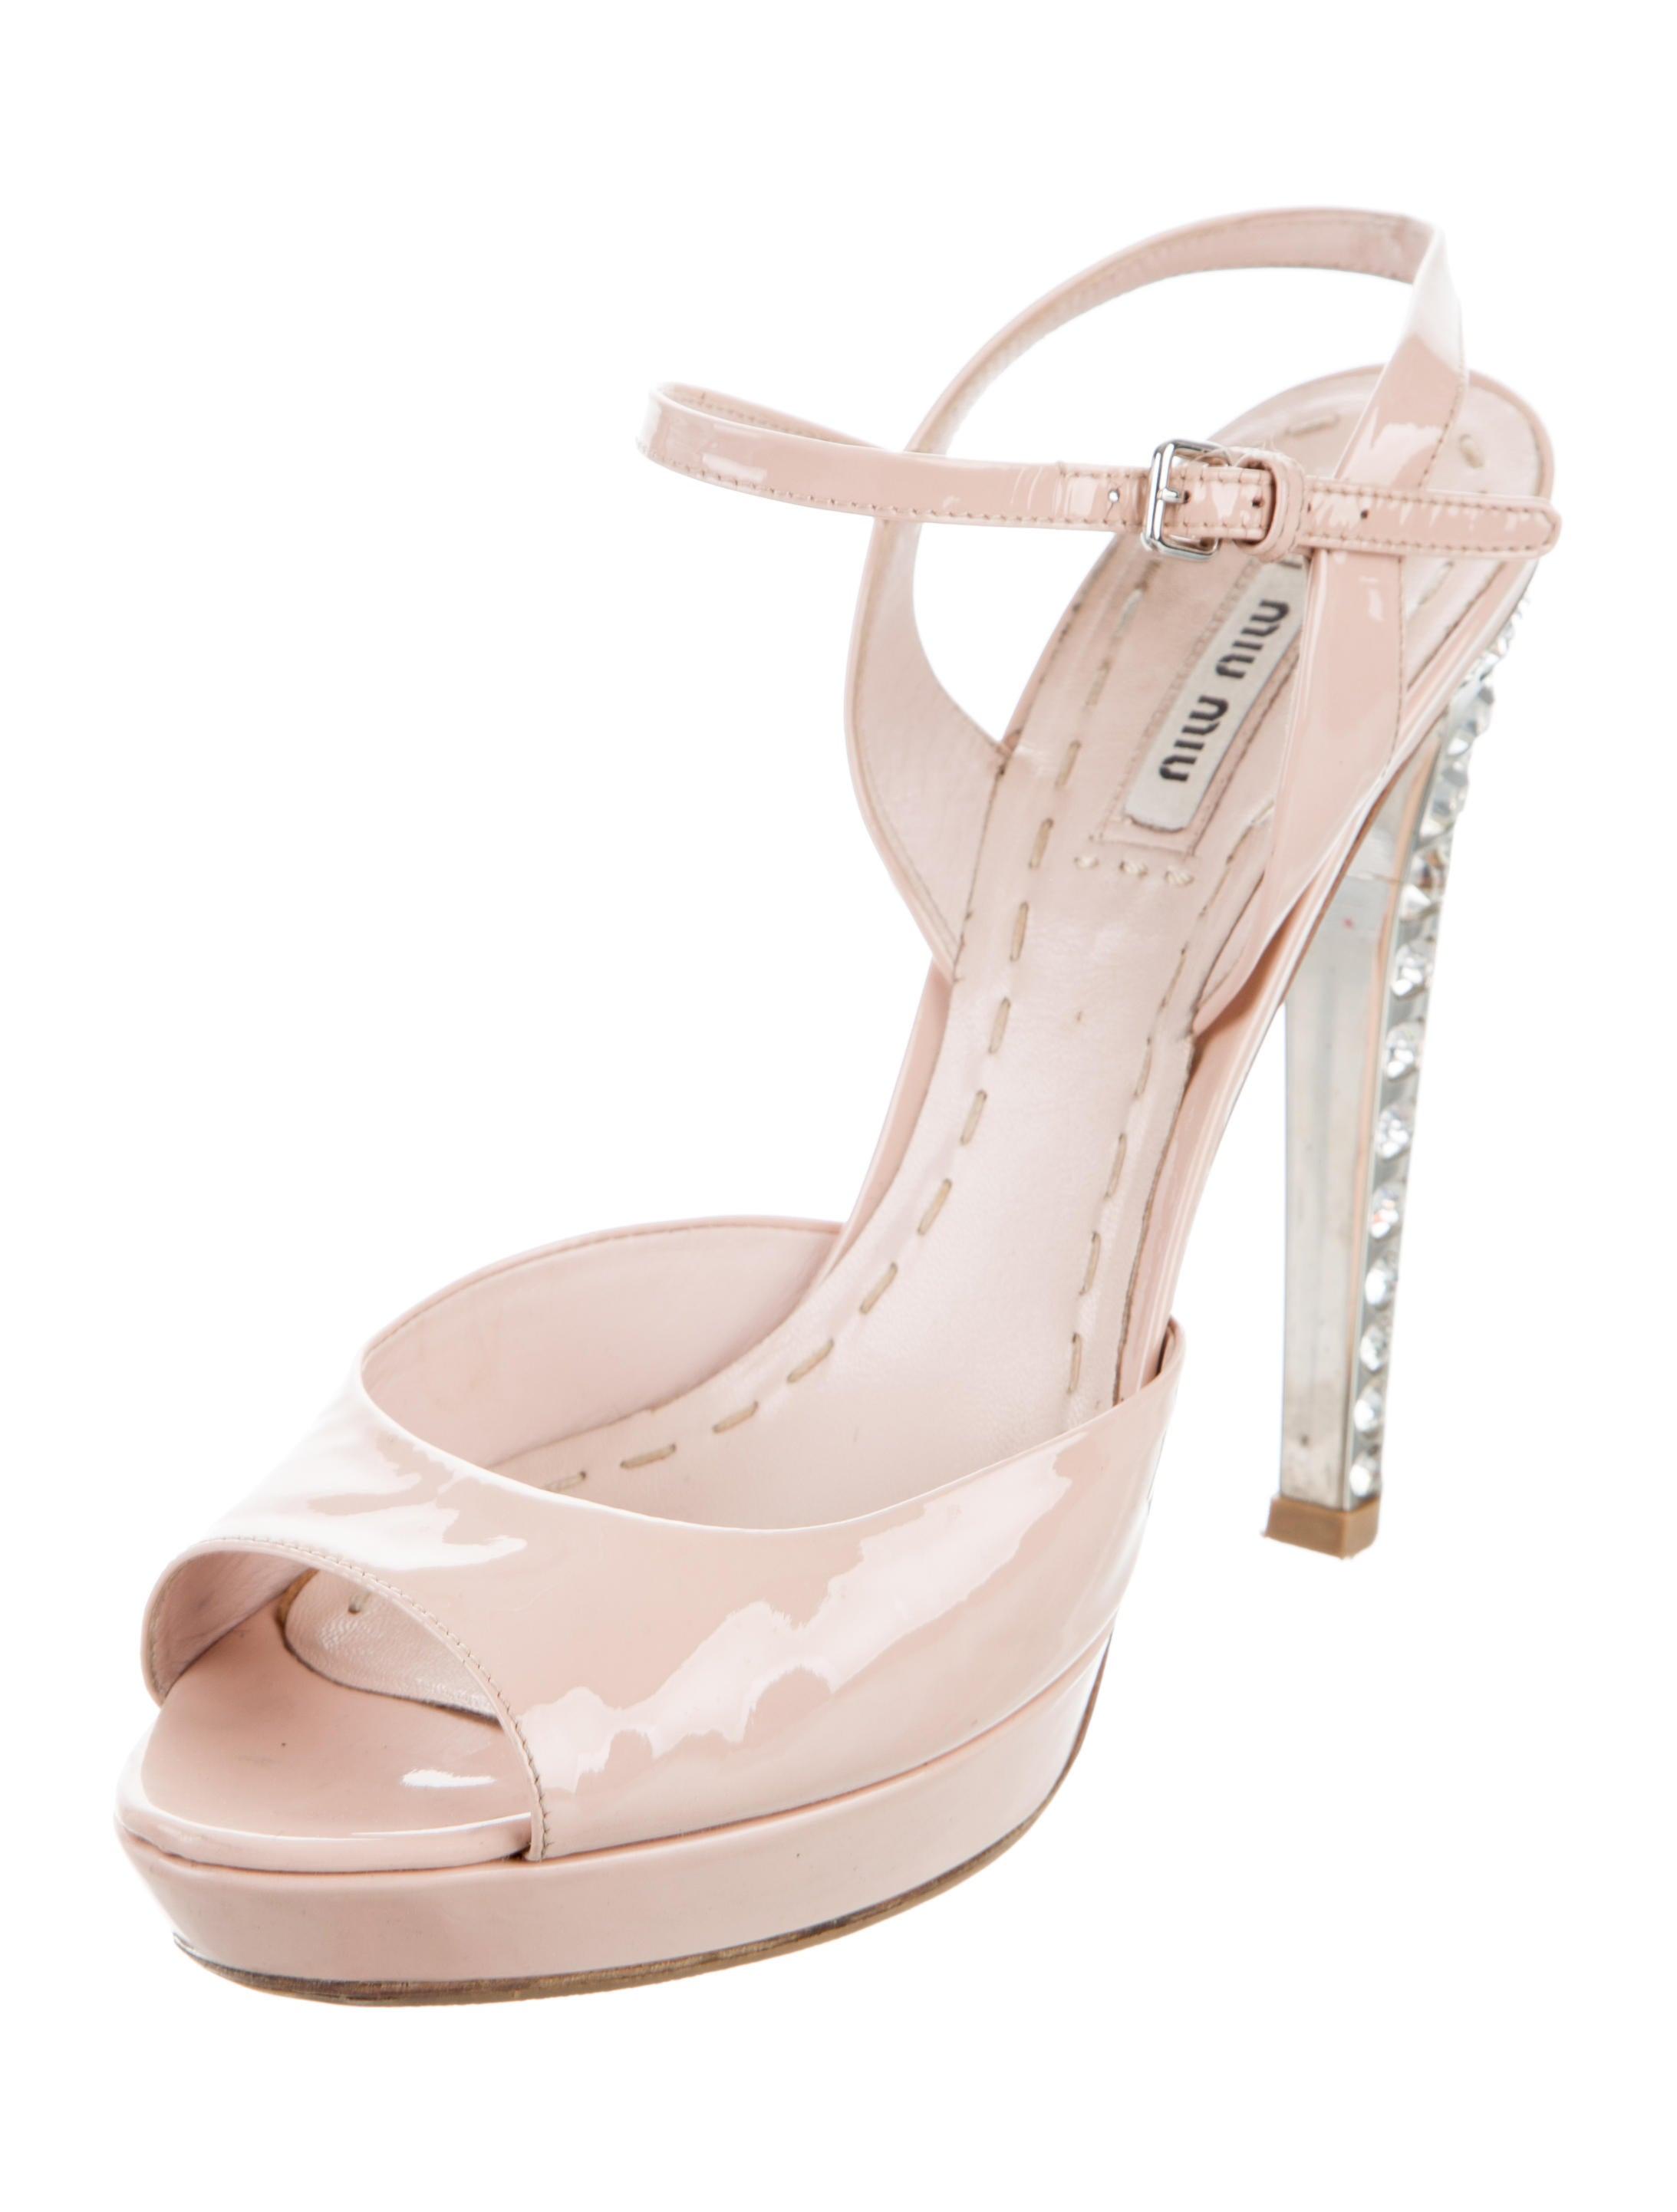 miu miu embellished platform sandals shoes miu53654